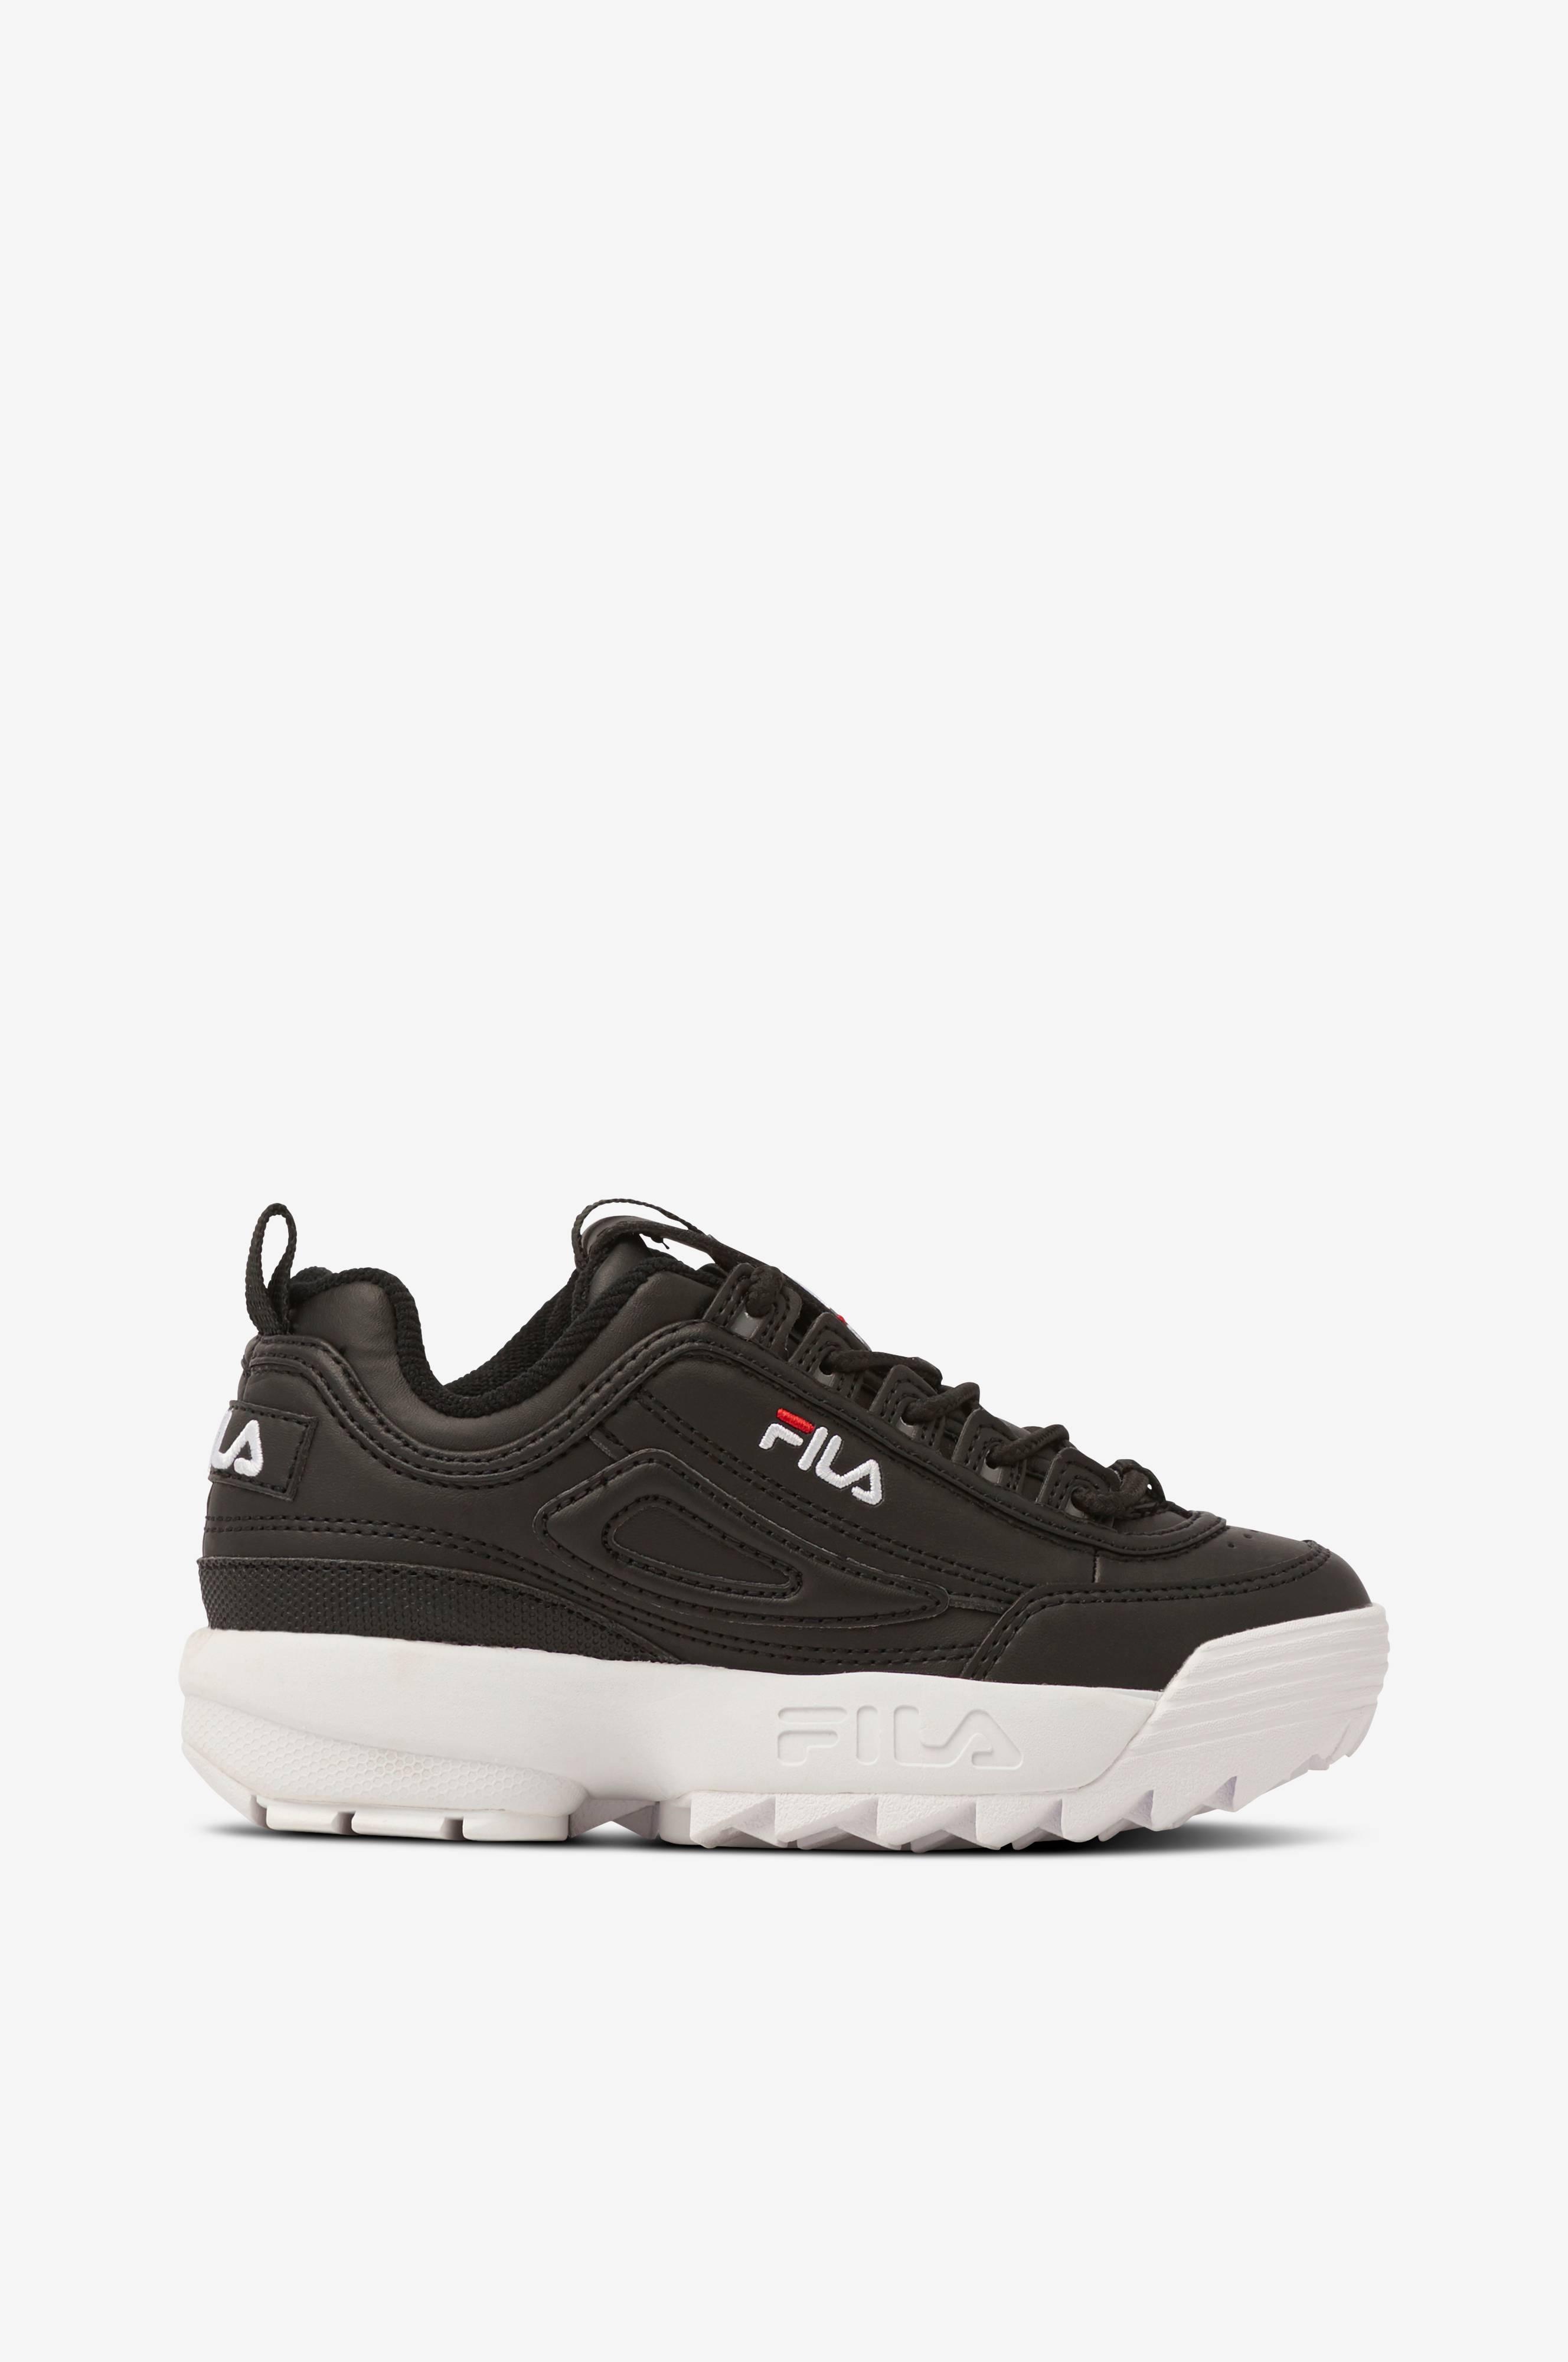 FILA Sneakers Disruptor Kids Hvit Barn Ellos.no